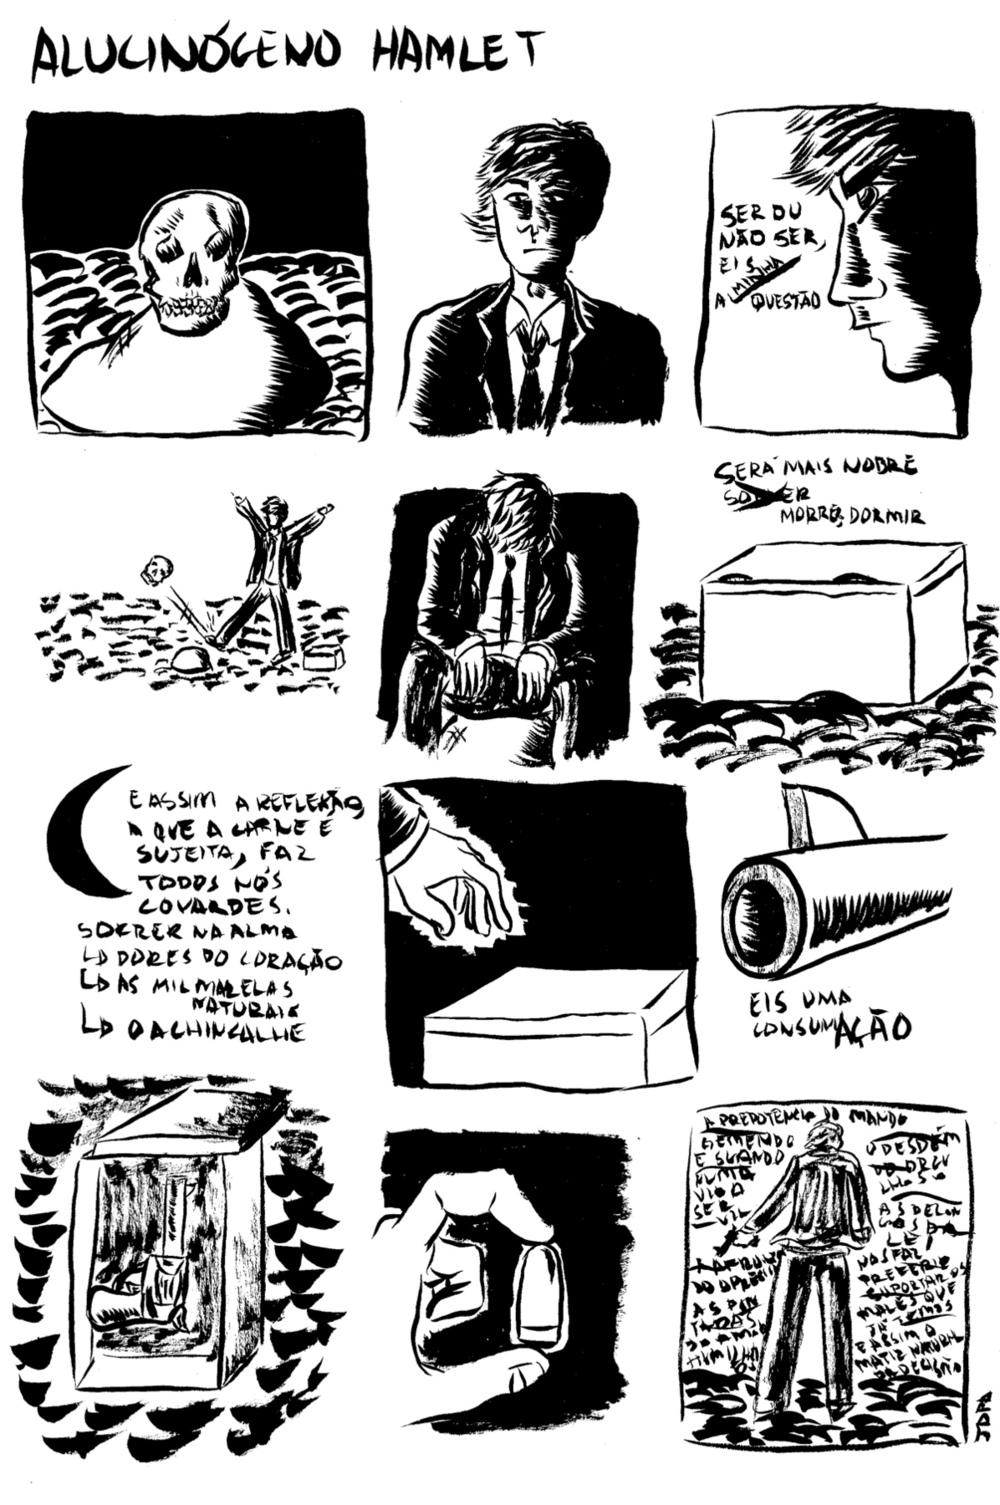 Vidro Embaçado - Página para o projeto Vidro Embaçado - 2012.